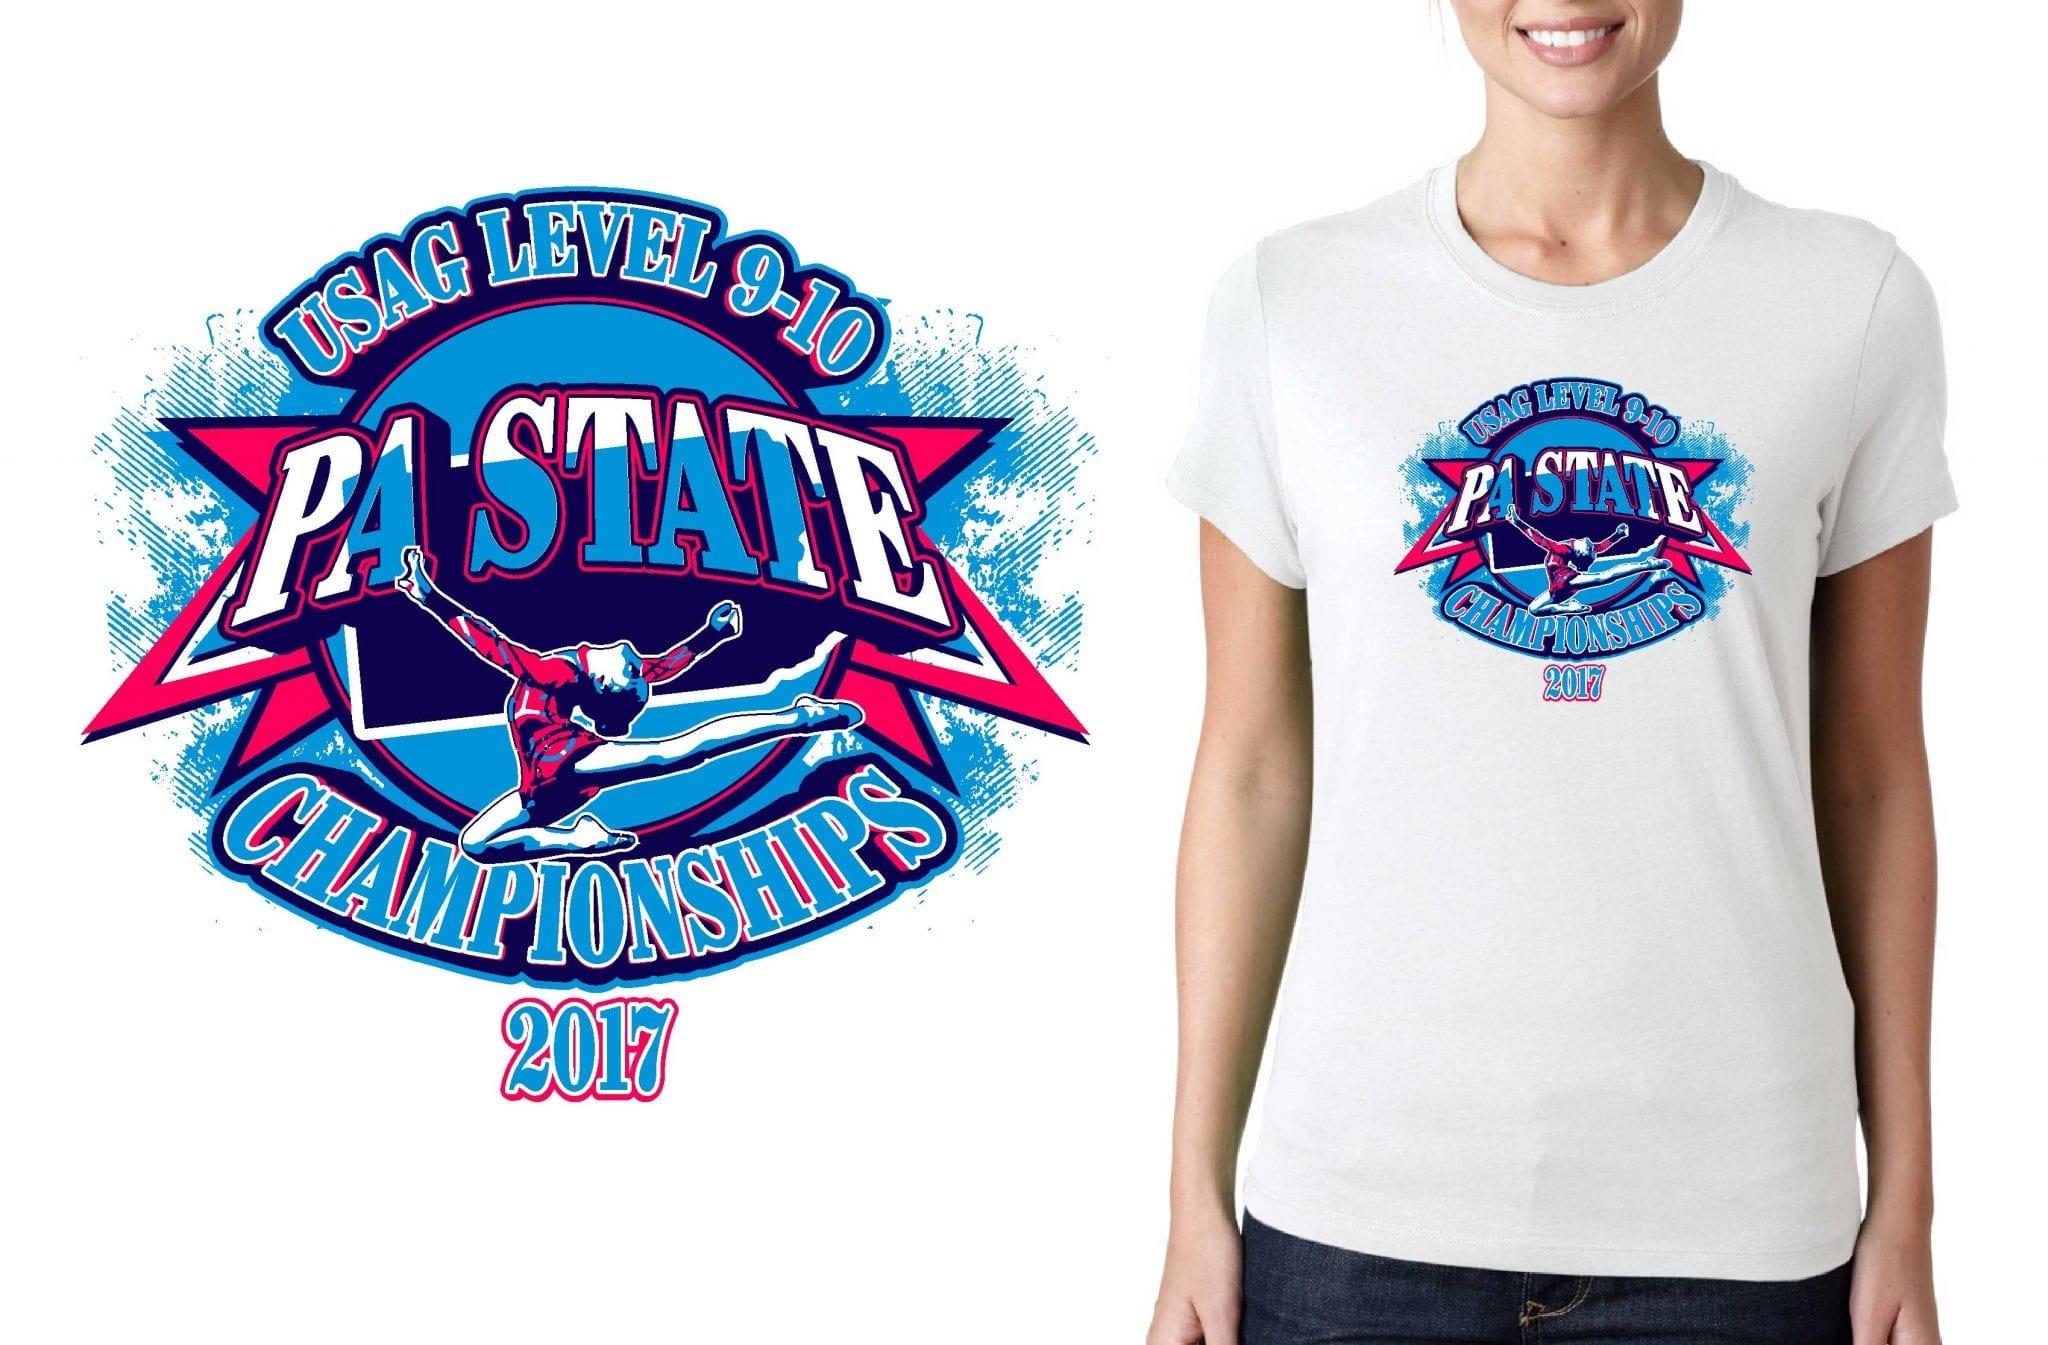 2017 Level 9 10 Pa State Championships Vector Logo Design